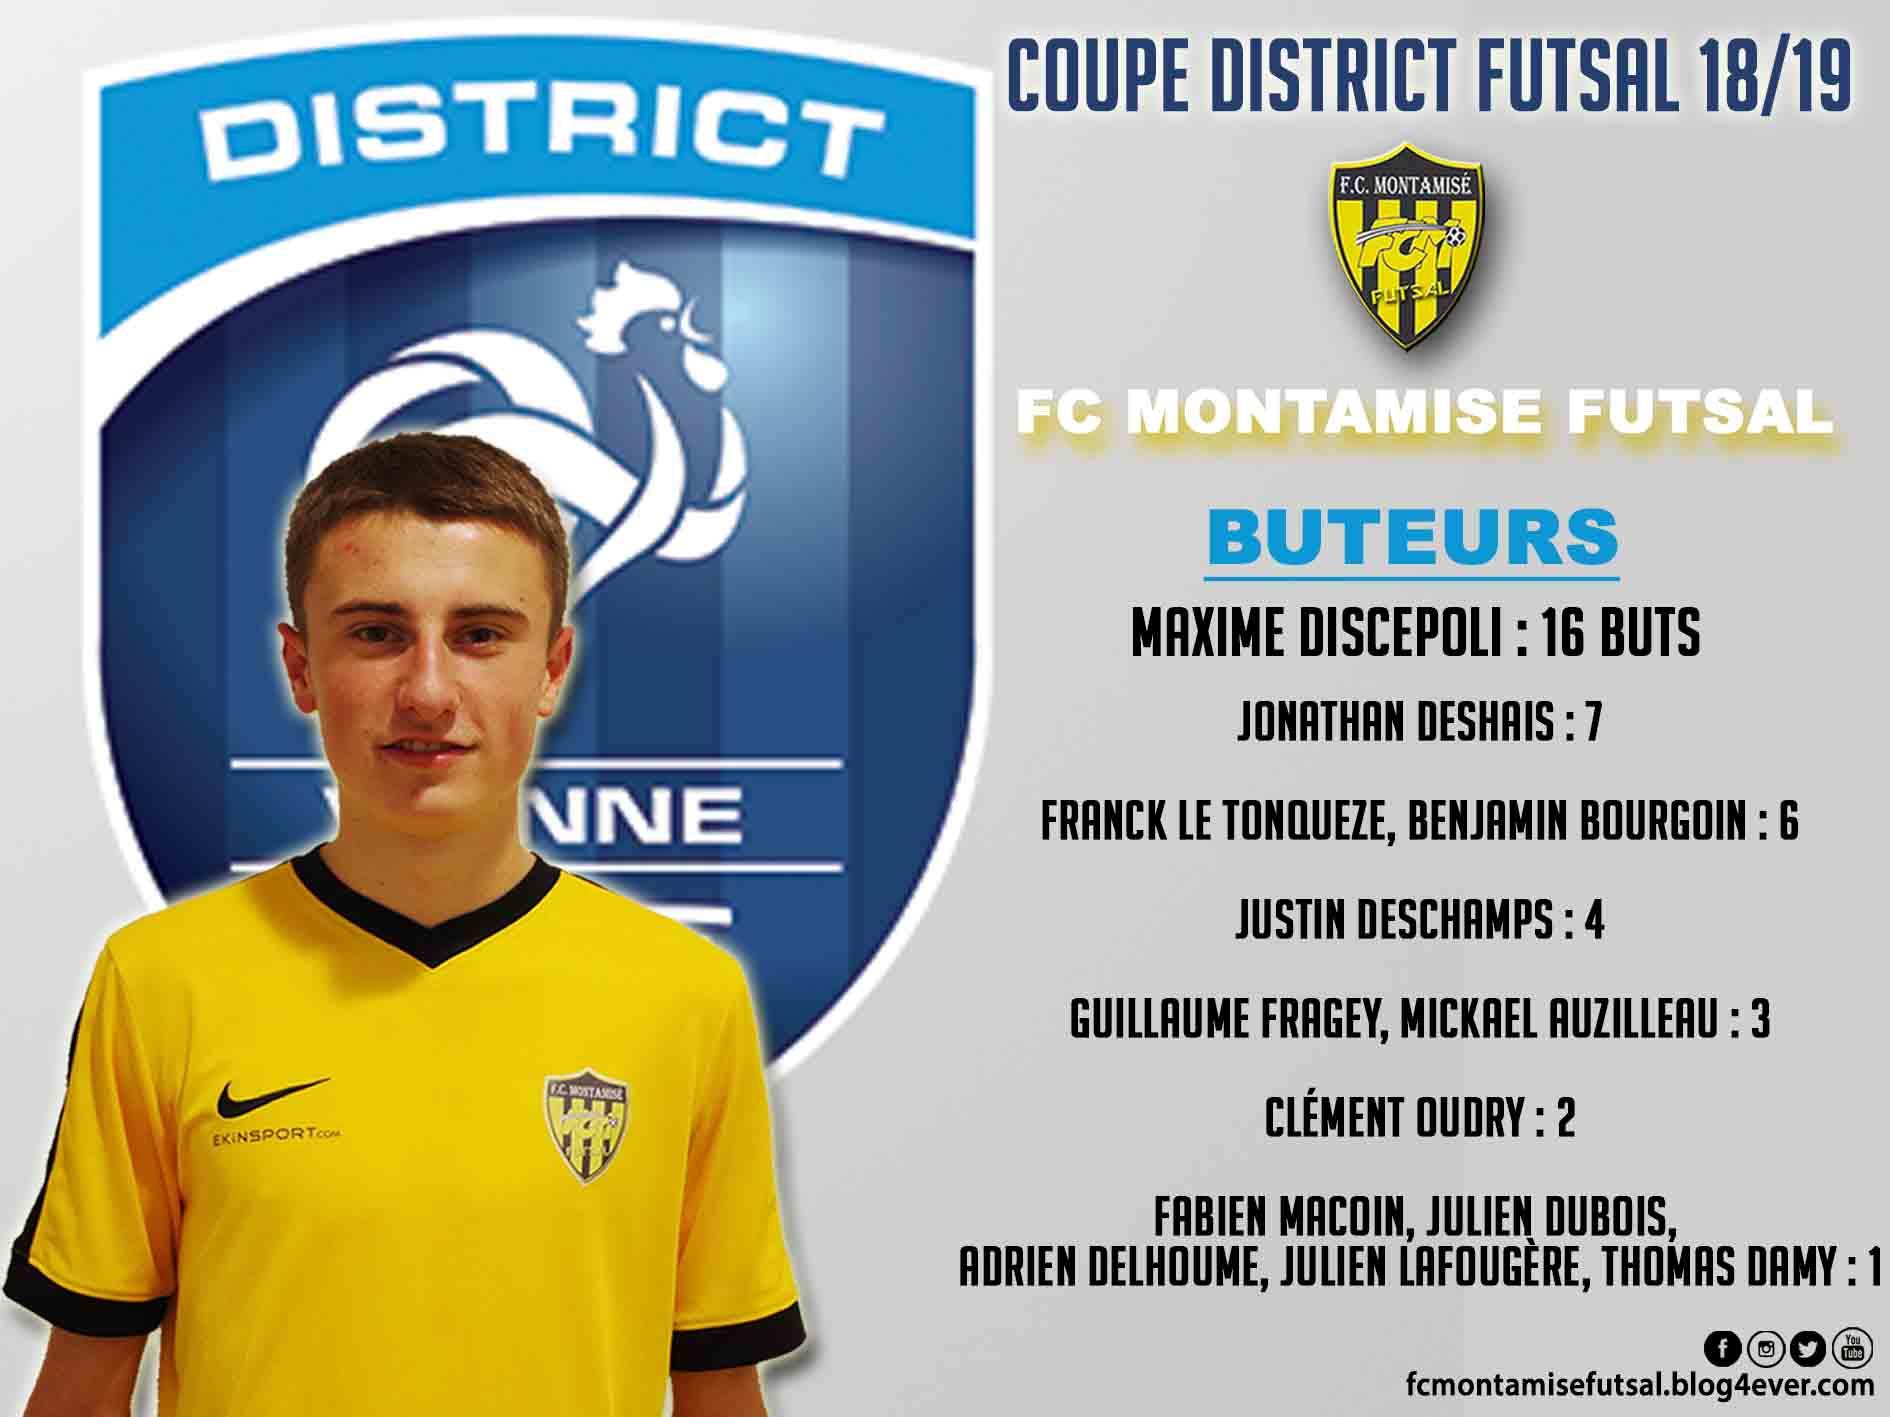 POULE R1 2018 2019 FC MONTAMISE FUTSAL.jpg